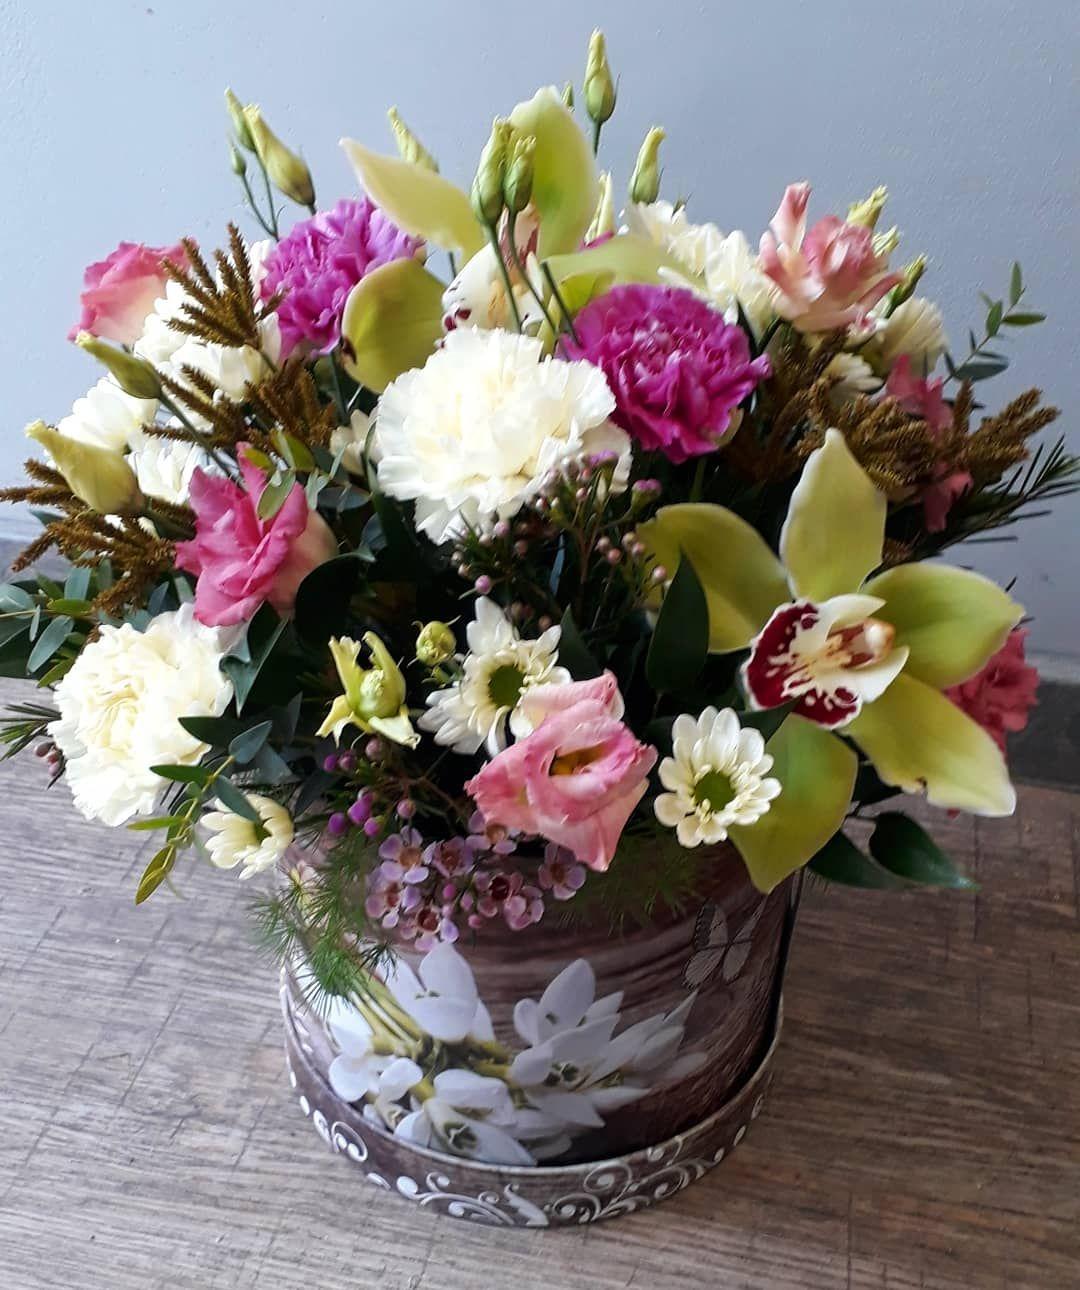 Flower Flowerbox Cymbidium Zielonecymbidium Gozdziki Margaretka Eustoma Wax Flower Boxes Flowers Decor